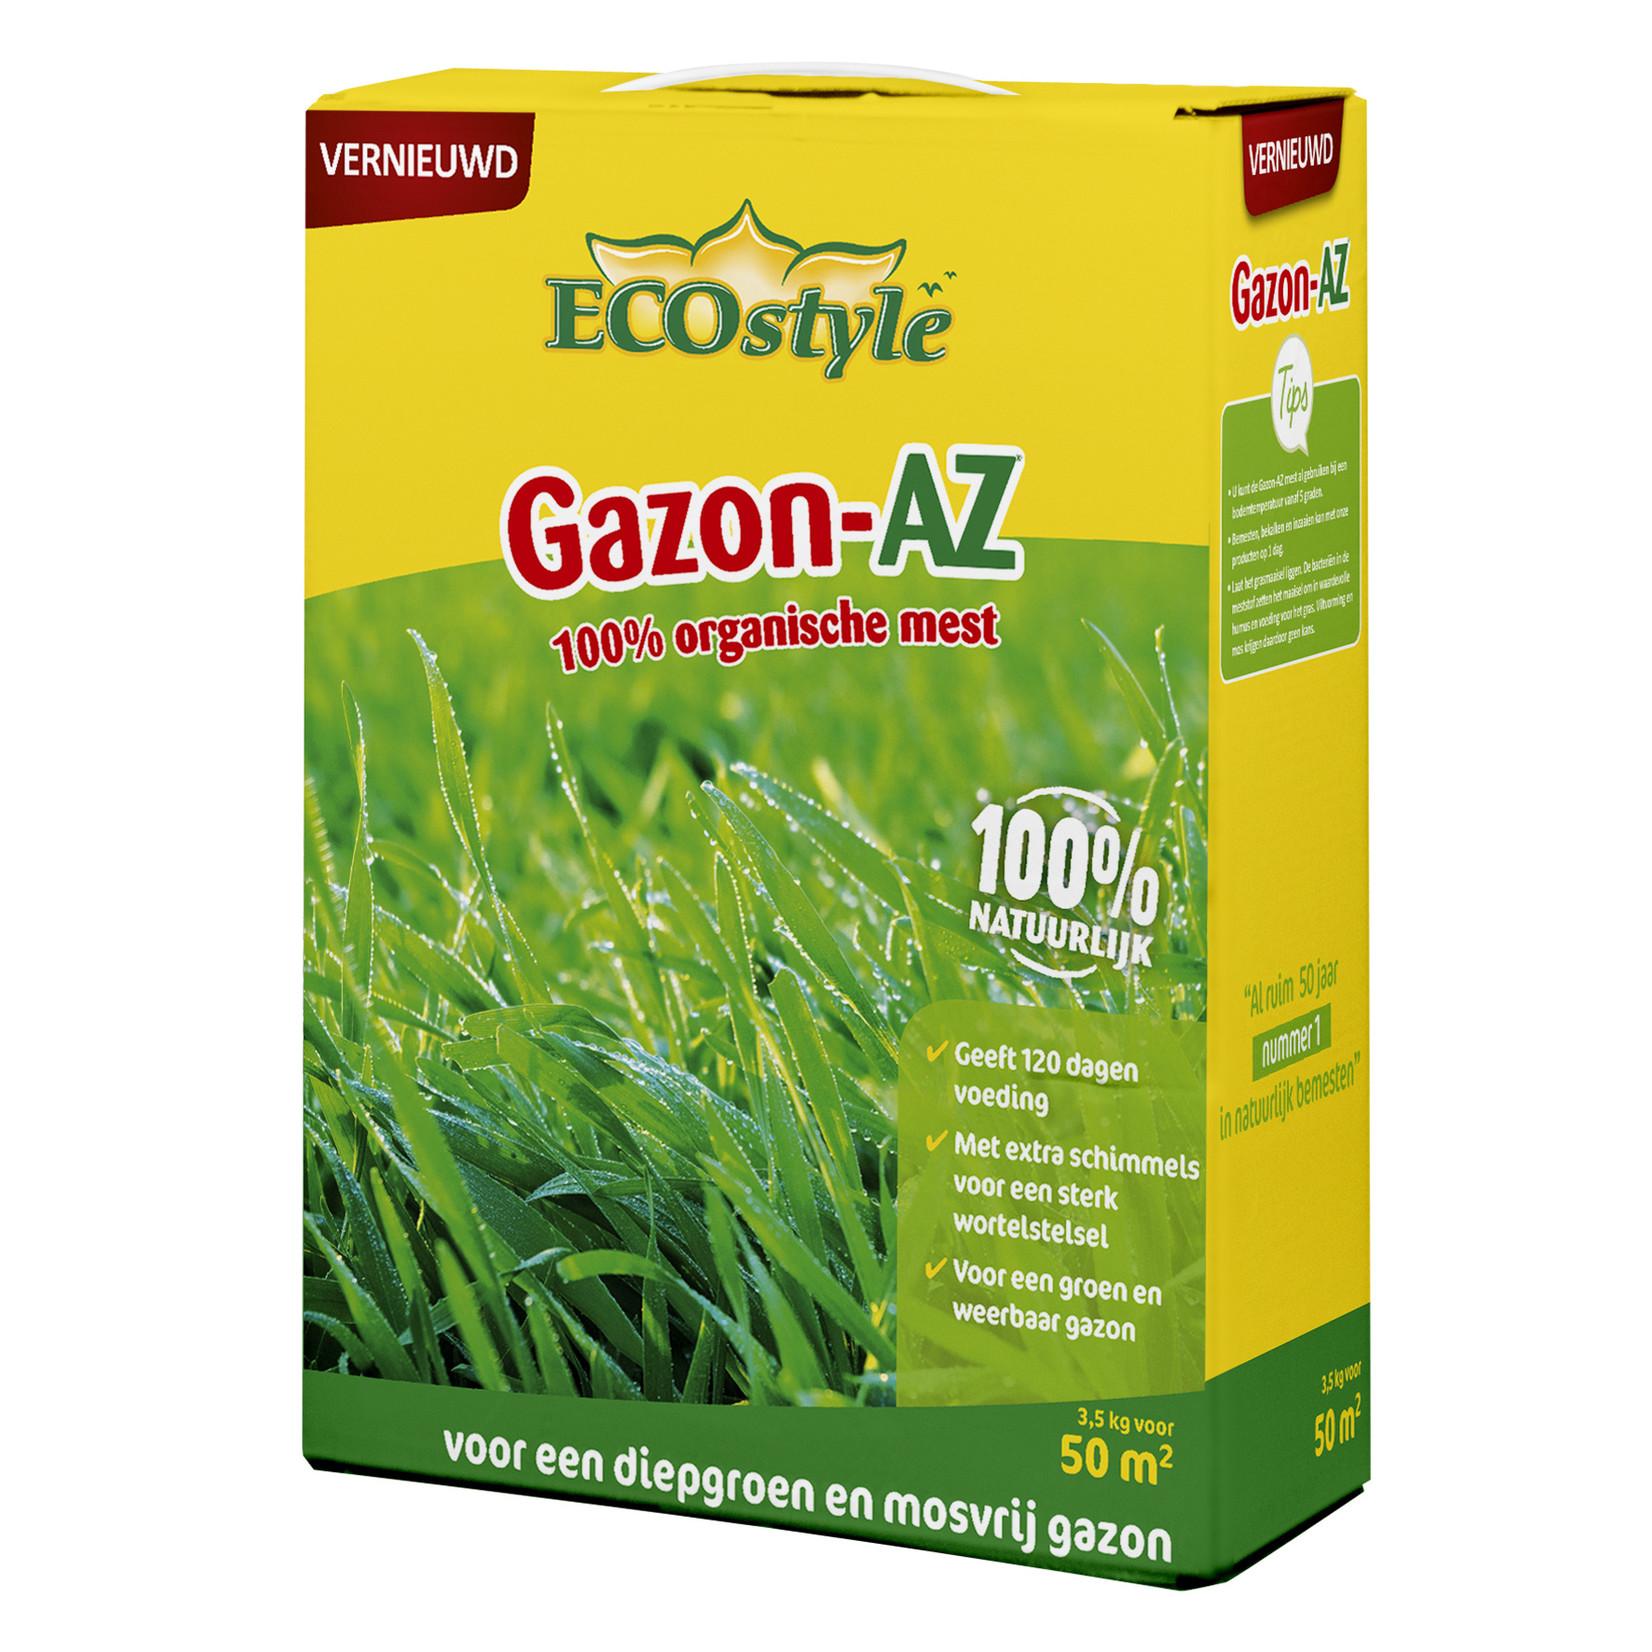 Ecostyle Gazon AZ 3.5 kg (50 m²) met ProtoPlus en RhizaMax